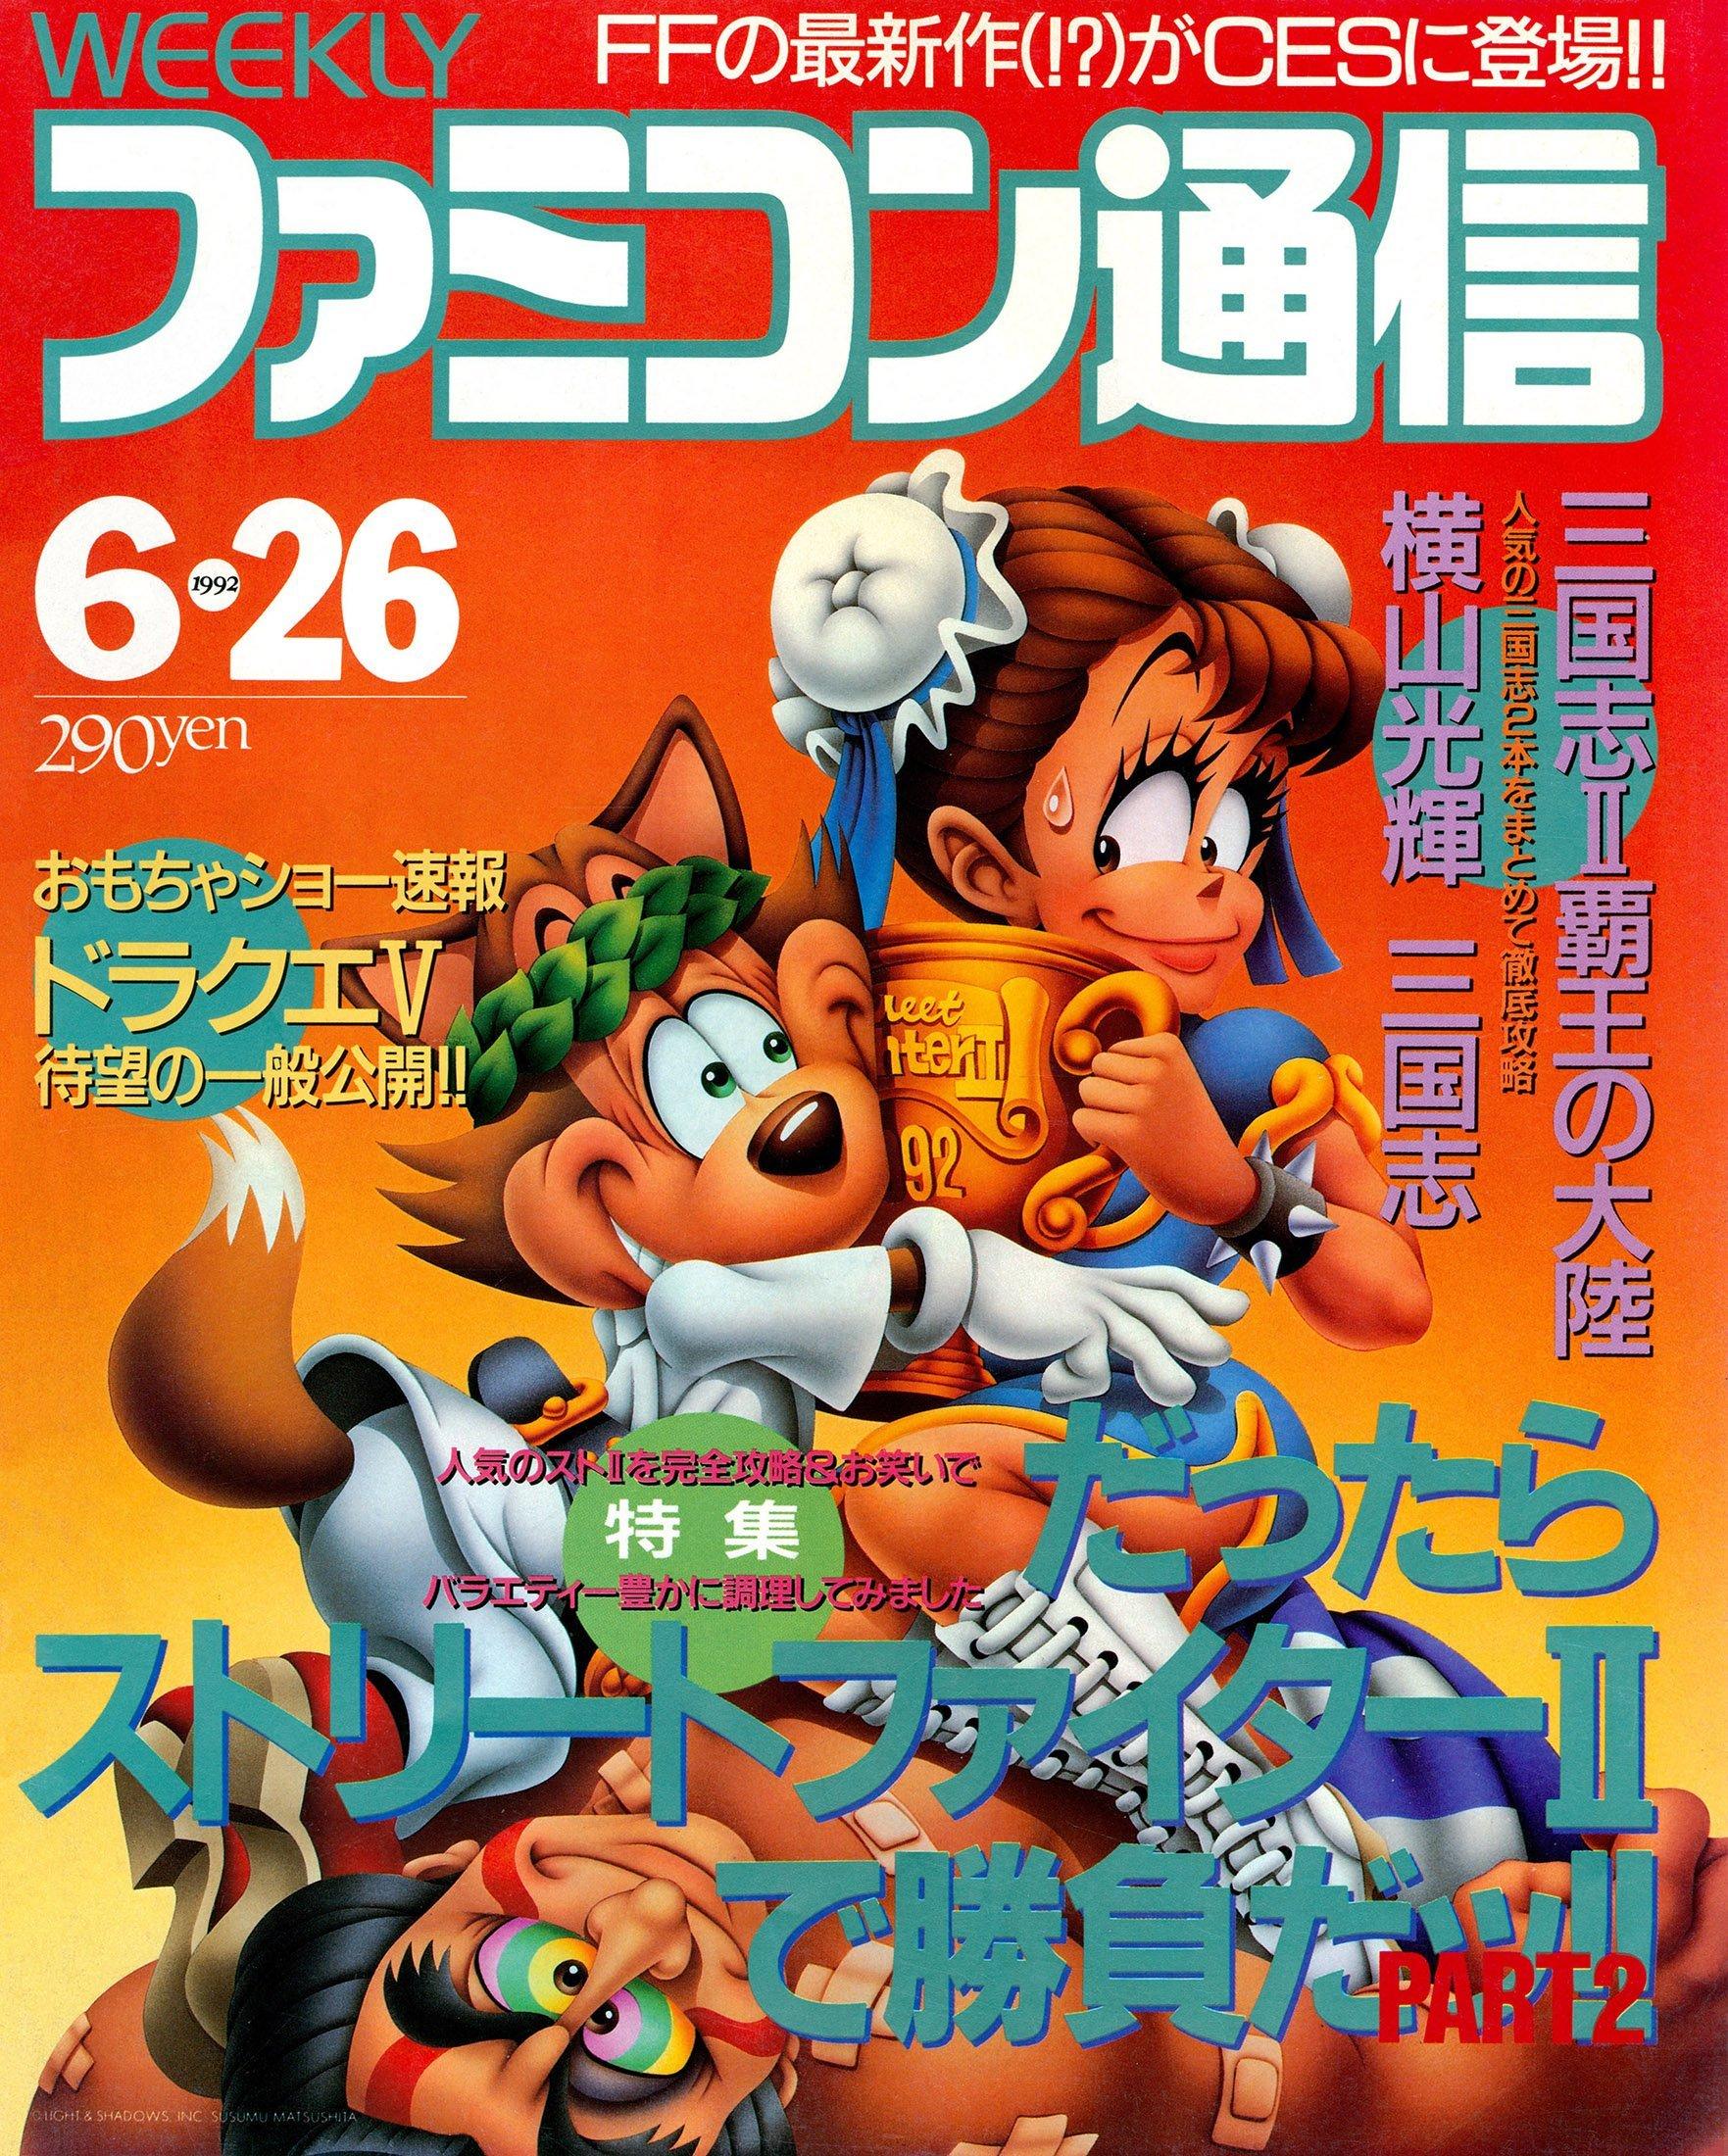 Famitsu 0184 (June 26, 1992)